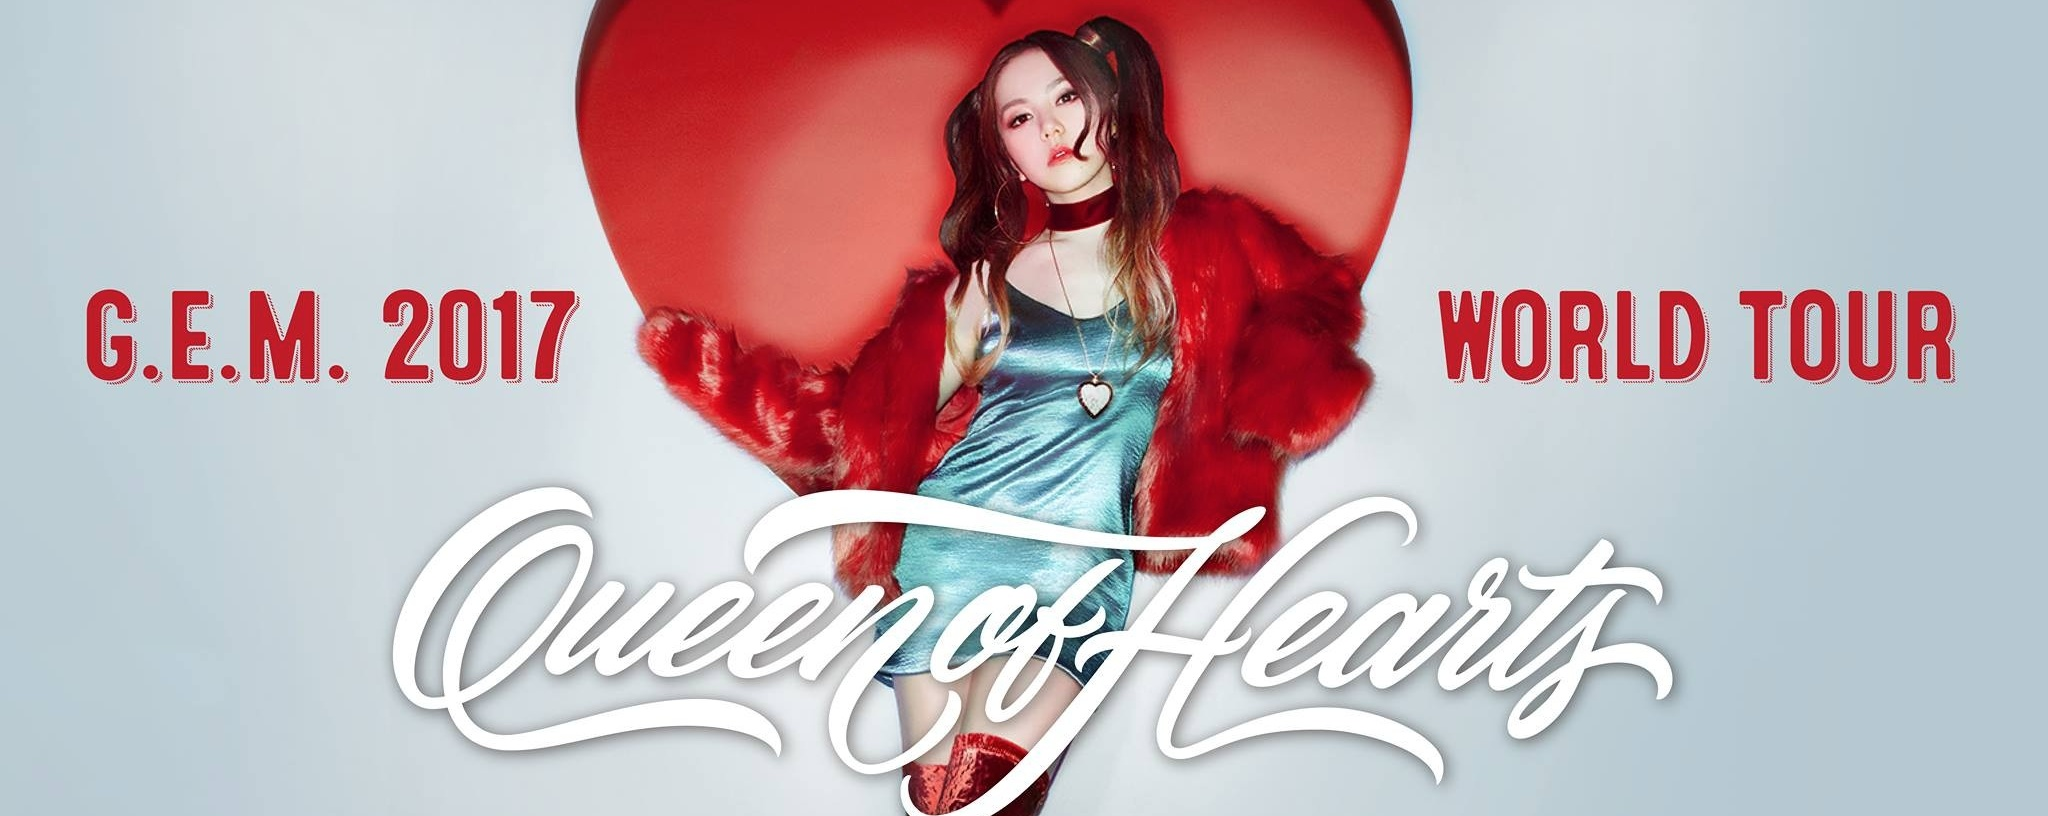 GEM Queen of Hearts World Tour Singapore